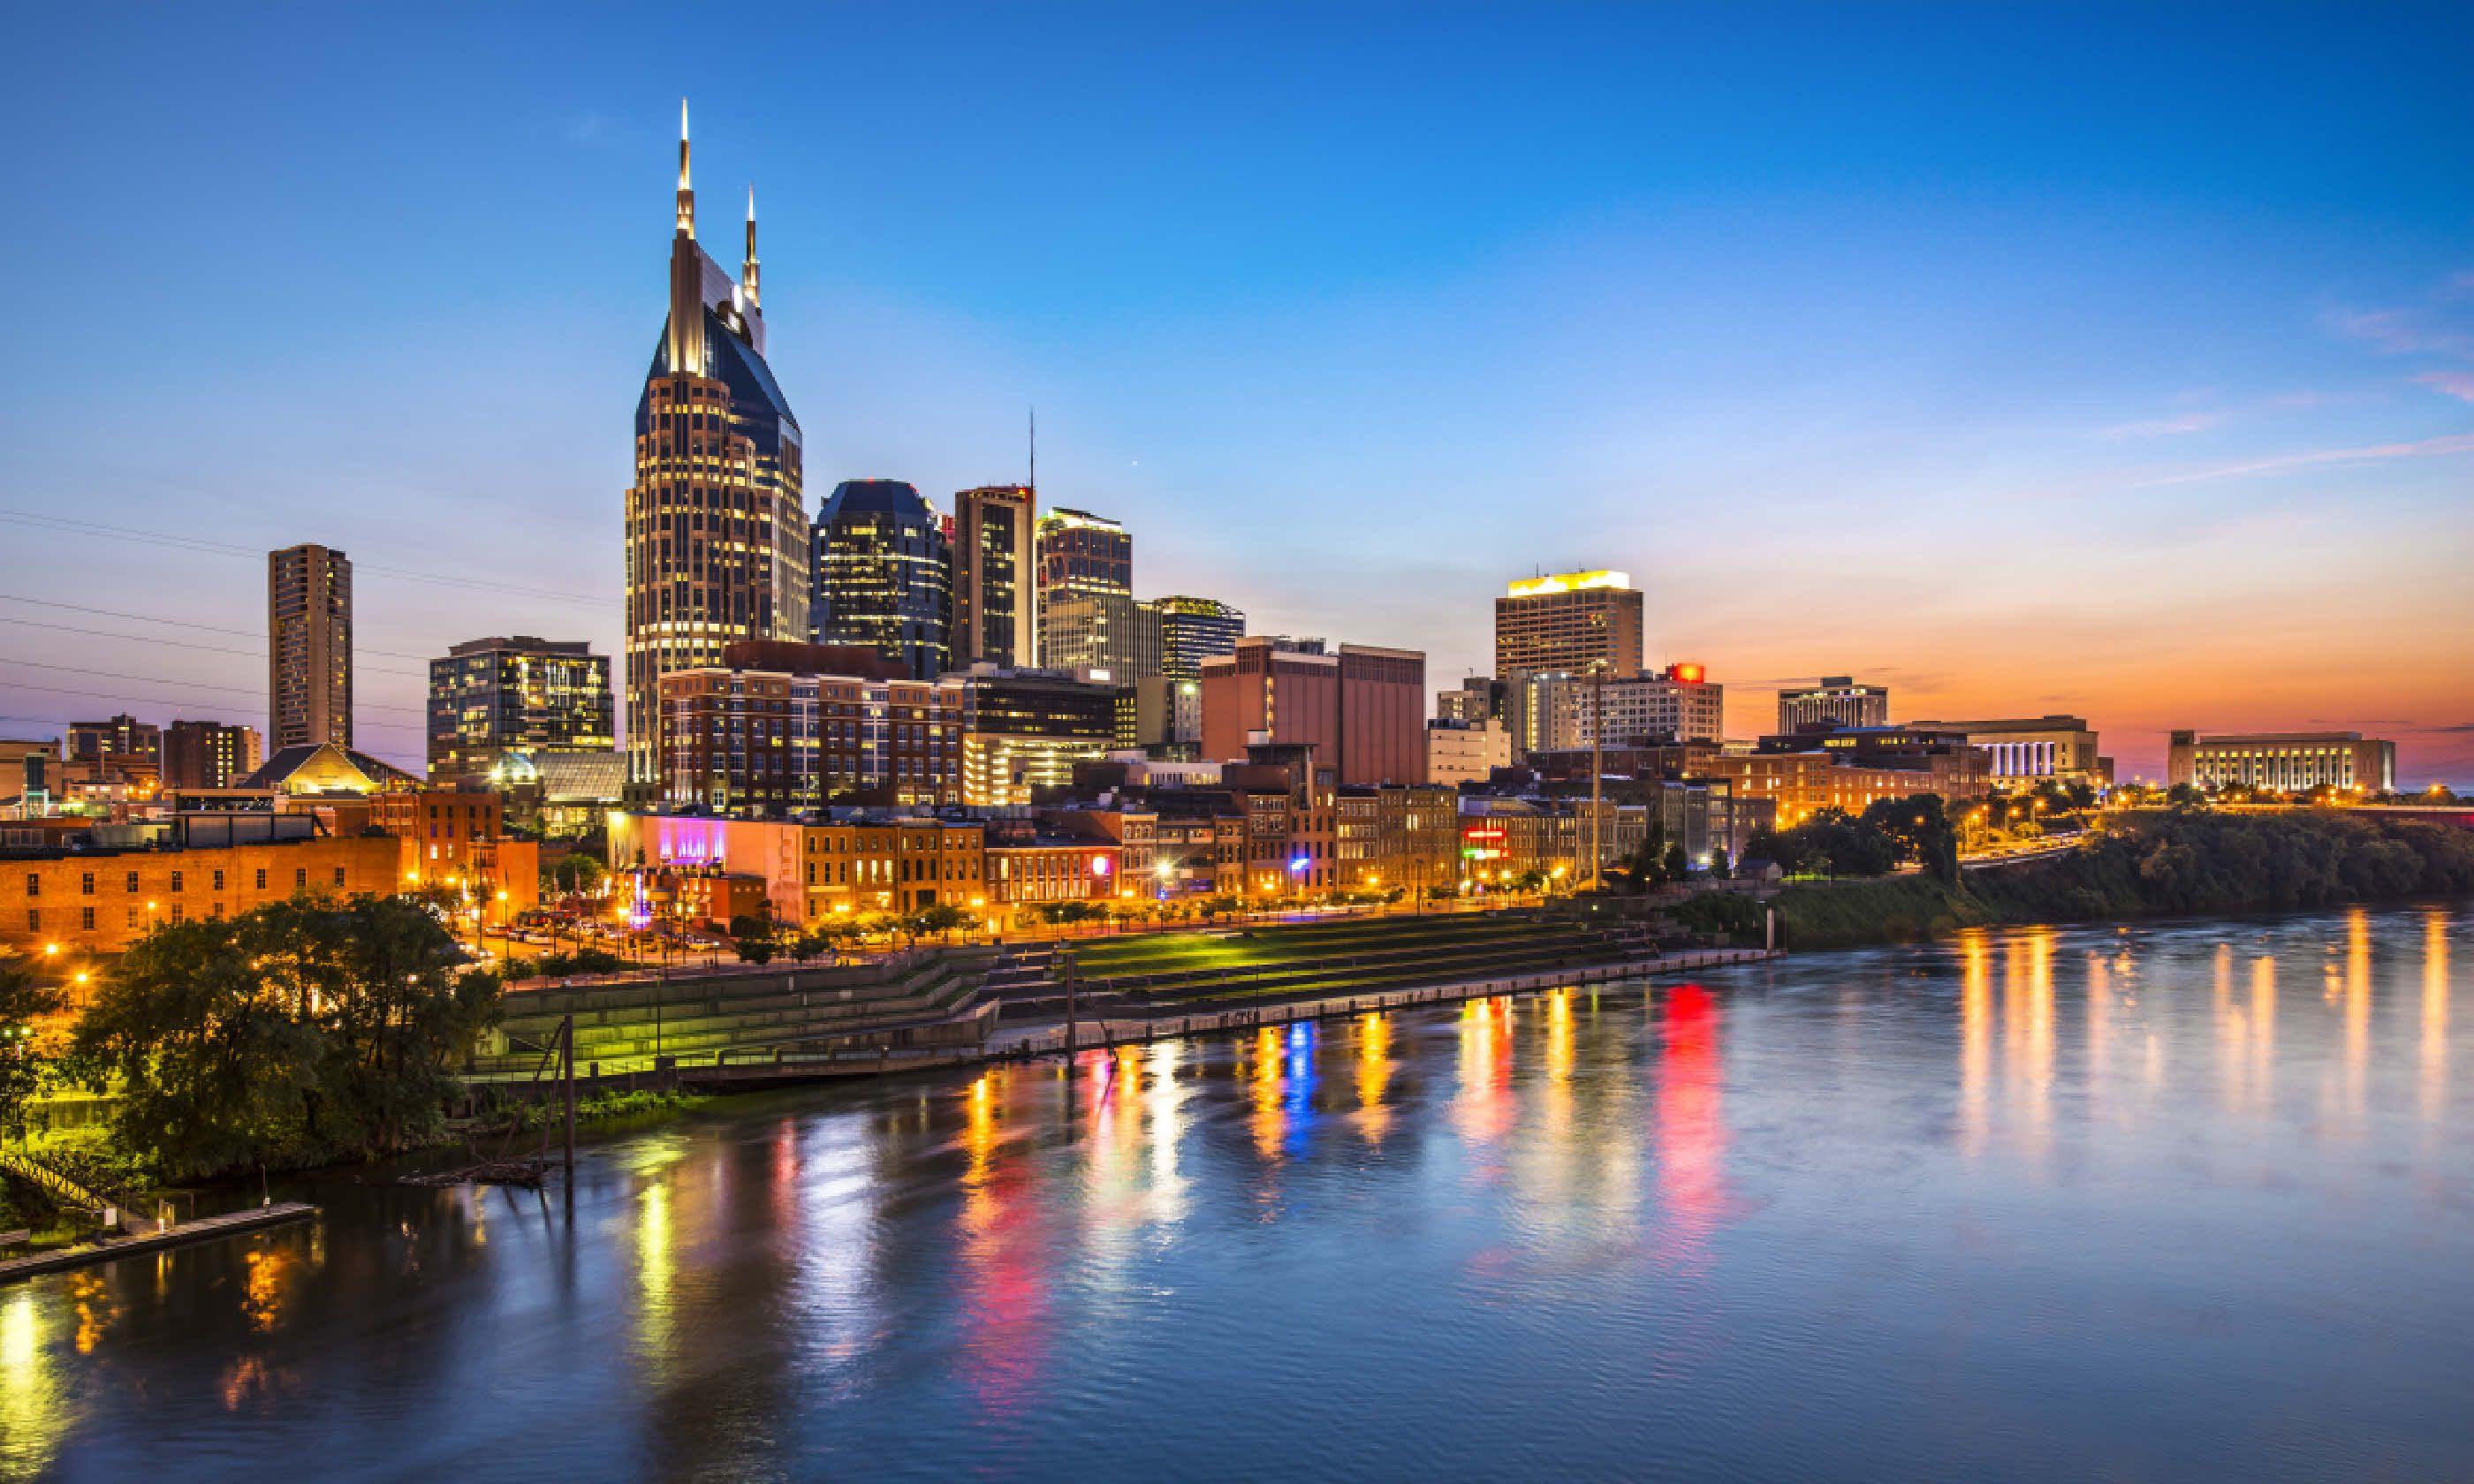 Skyline of downtown Nashville, Tennessee (Shutterstock)